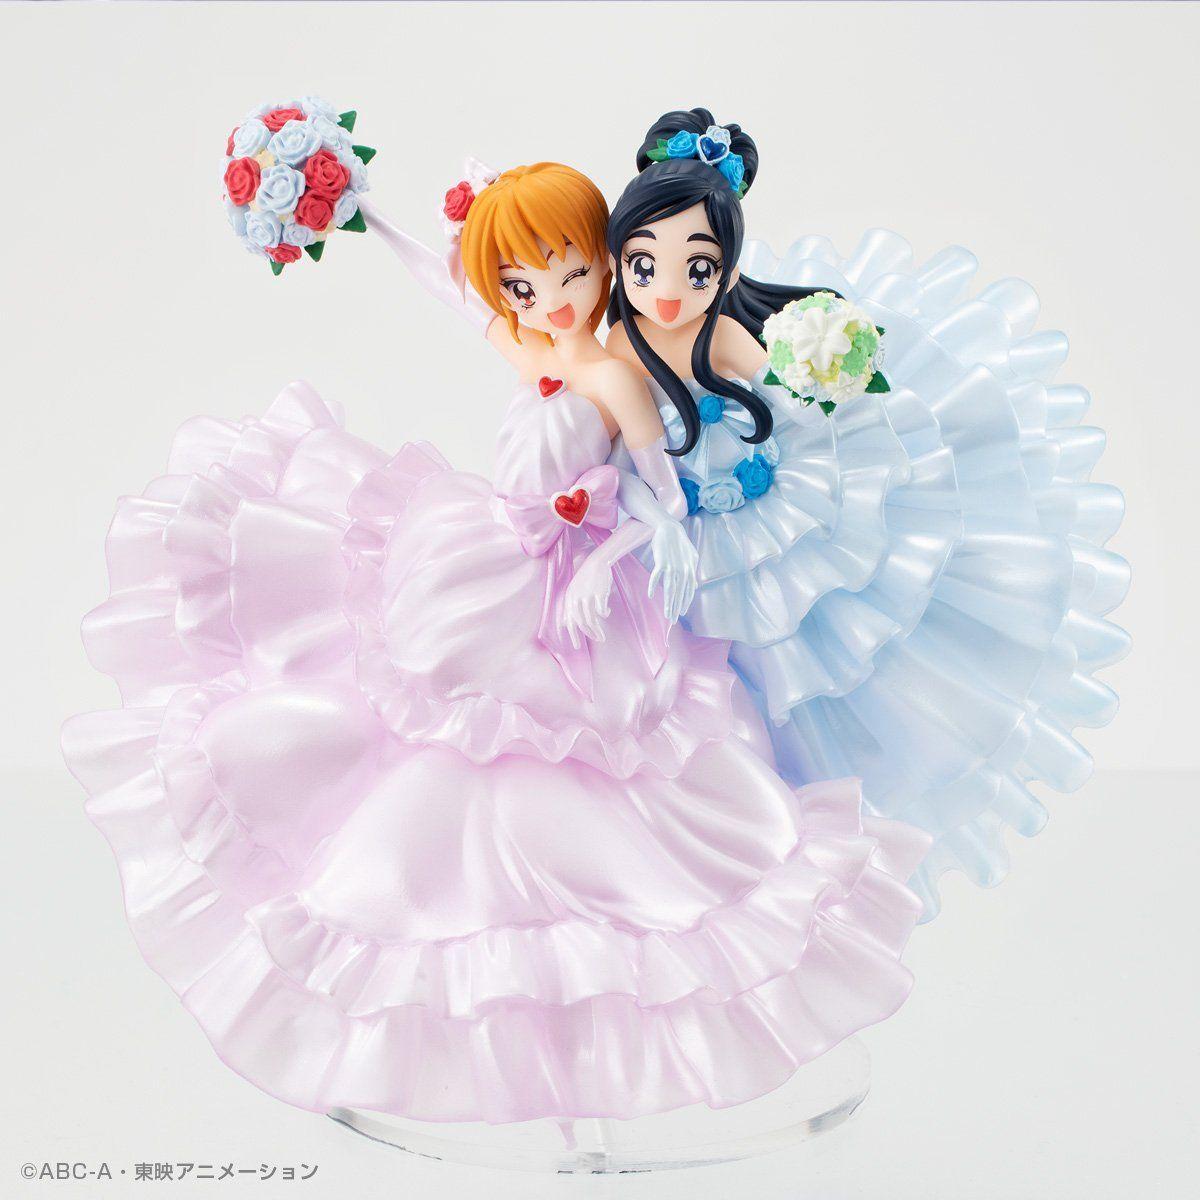 HG GIRLS『ふたりはプリキュアメモリアルフィギュア』完成品フィギュア-001